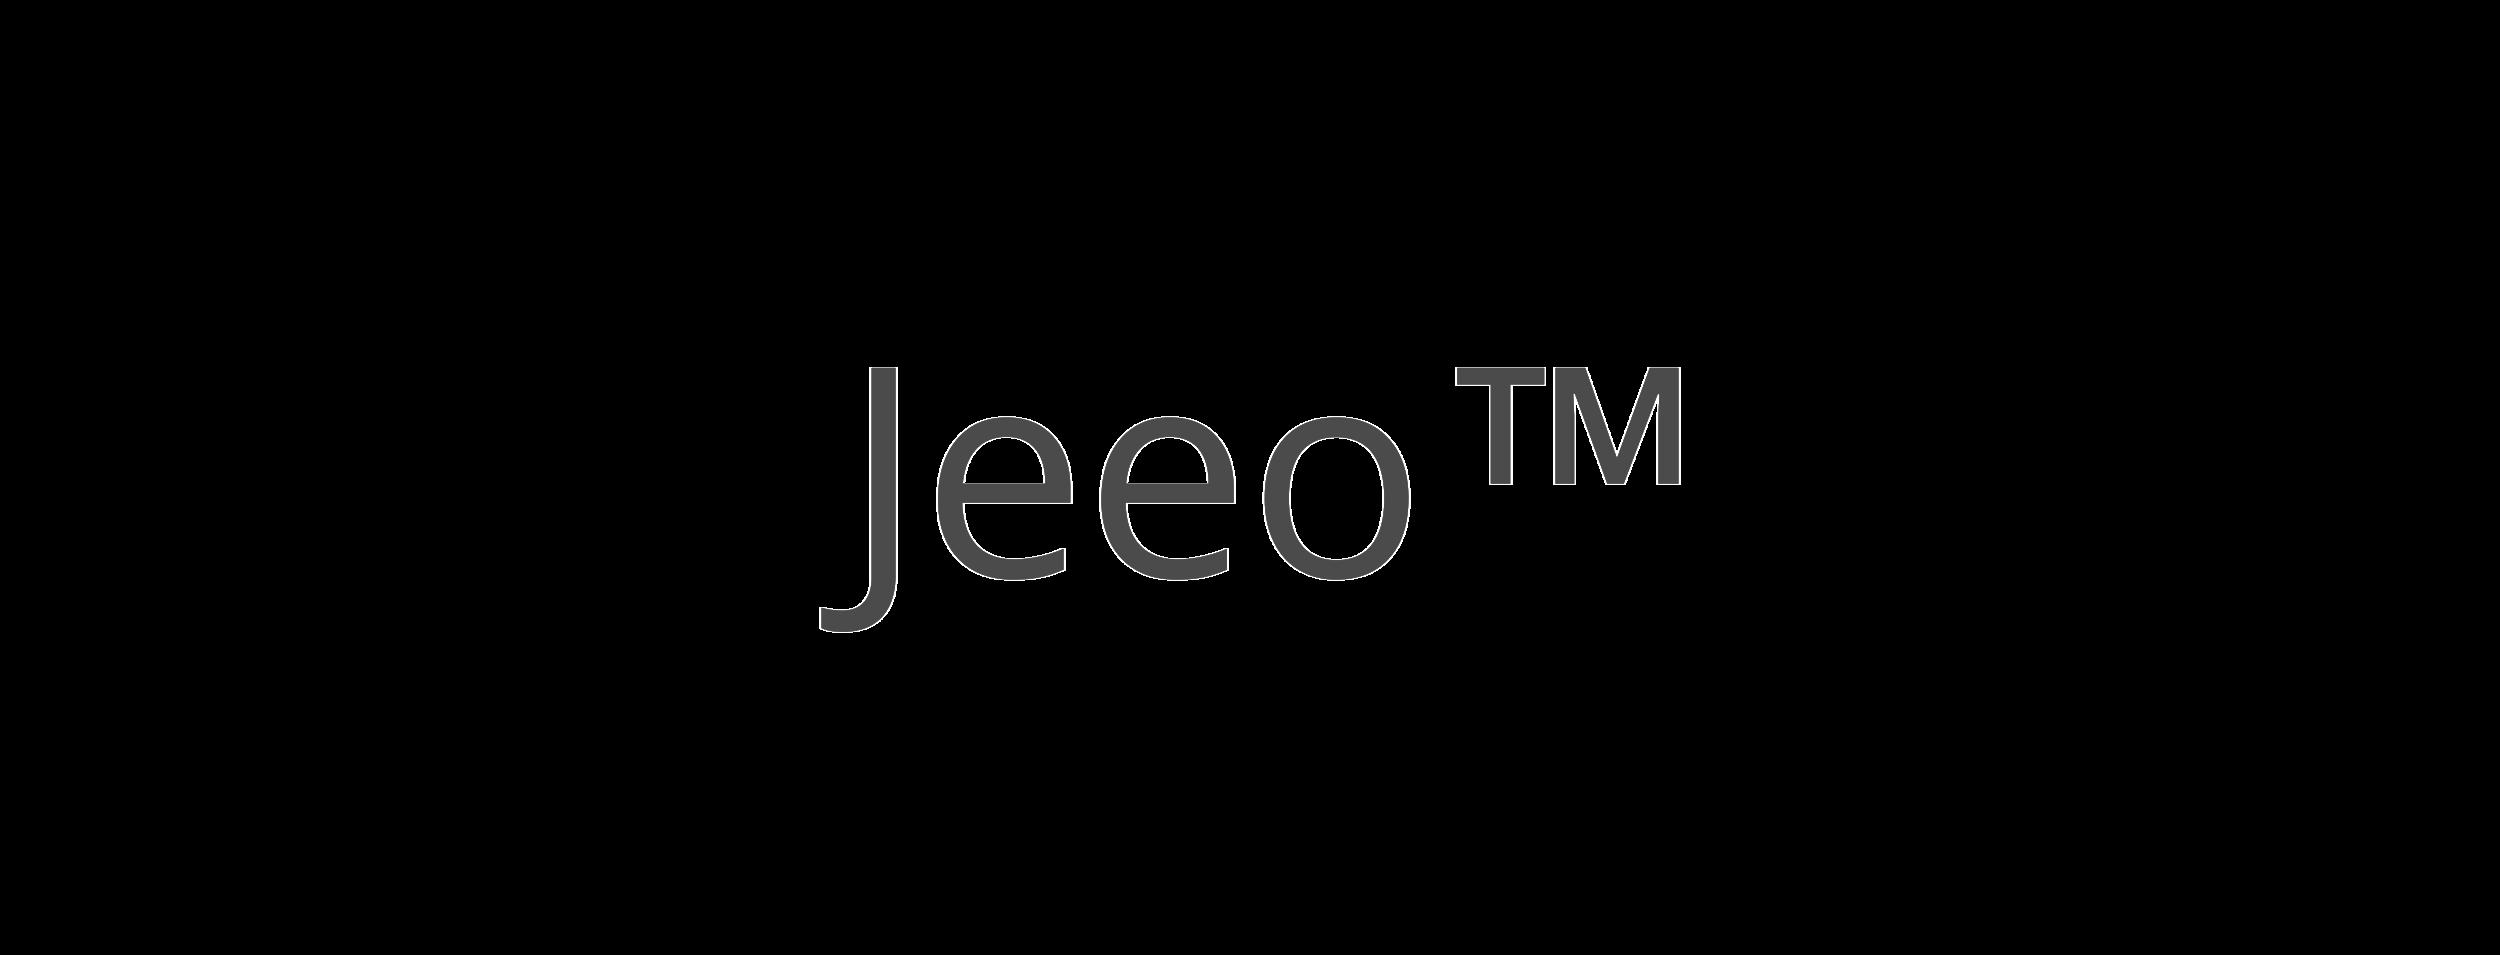 Jeeos-01.png